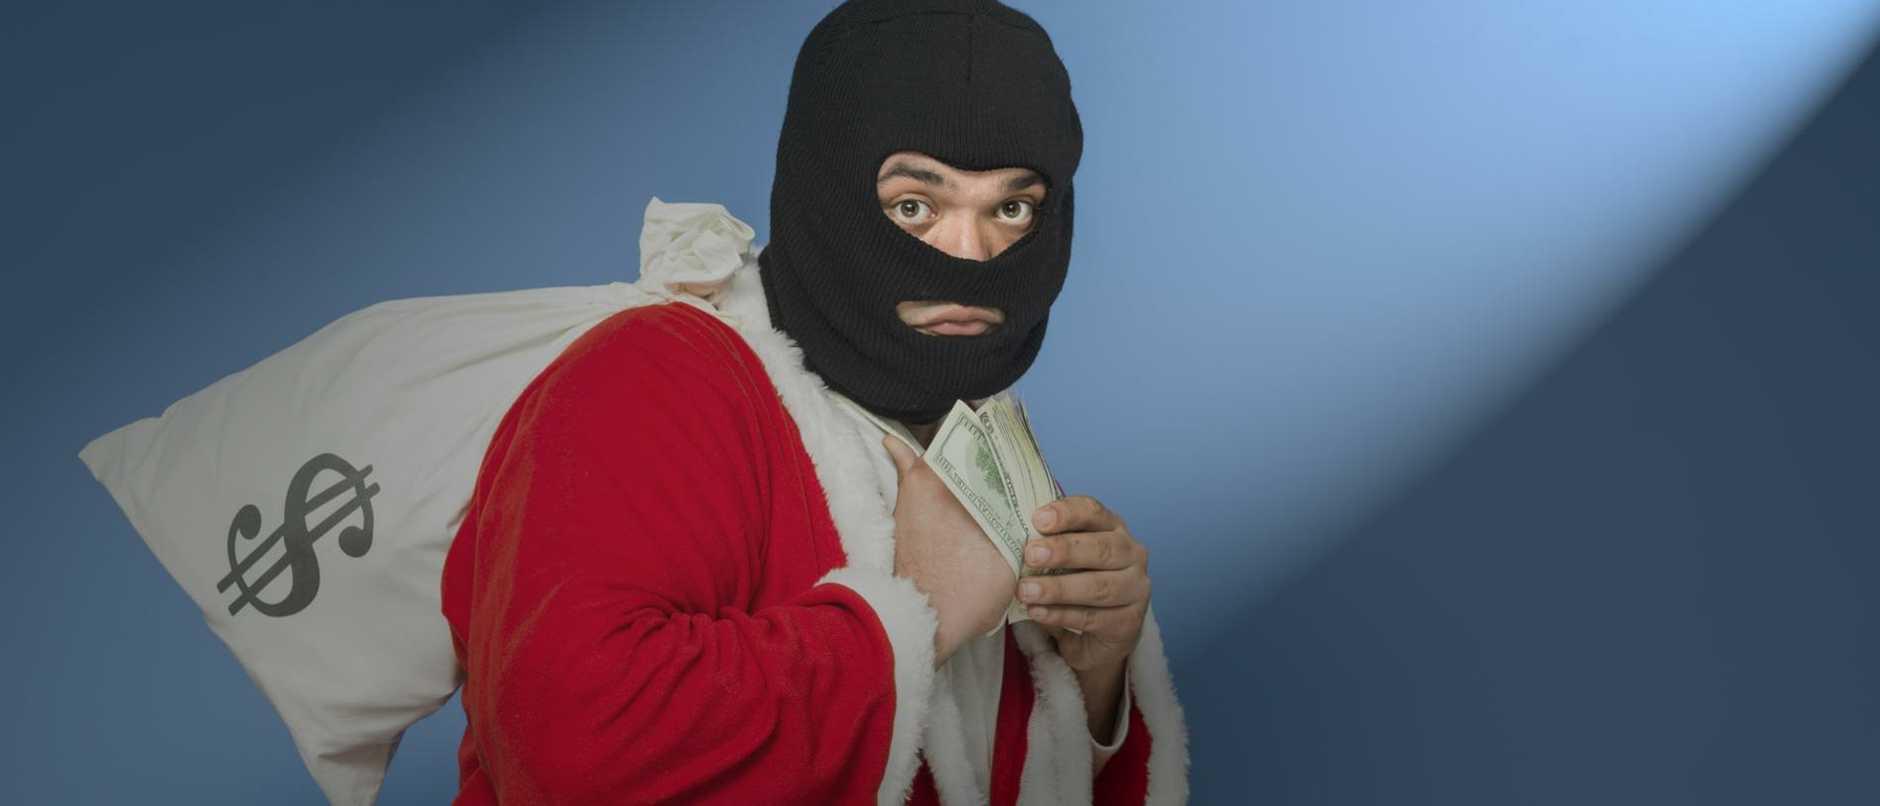 Man Wearing St Nicholas Costume And Mask Stealing Money Bag